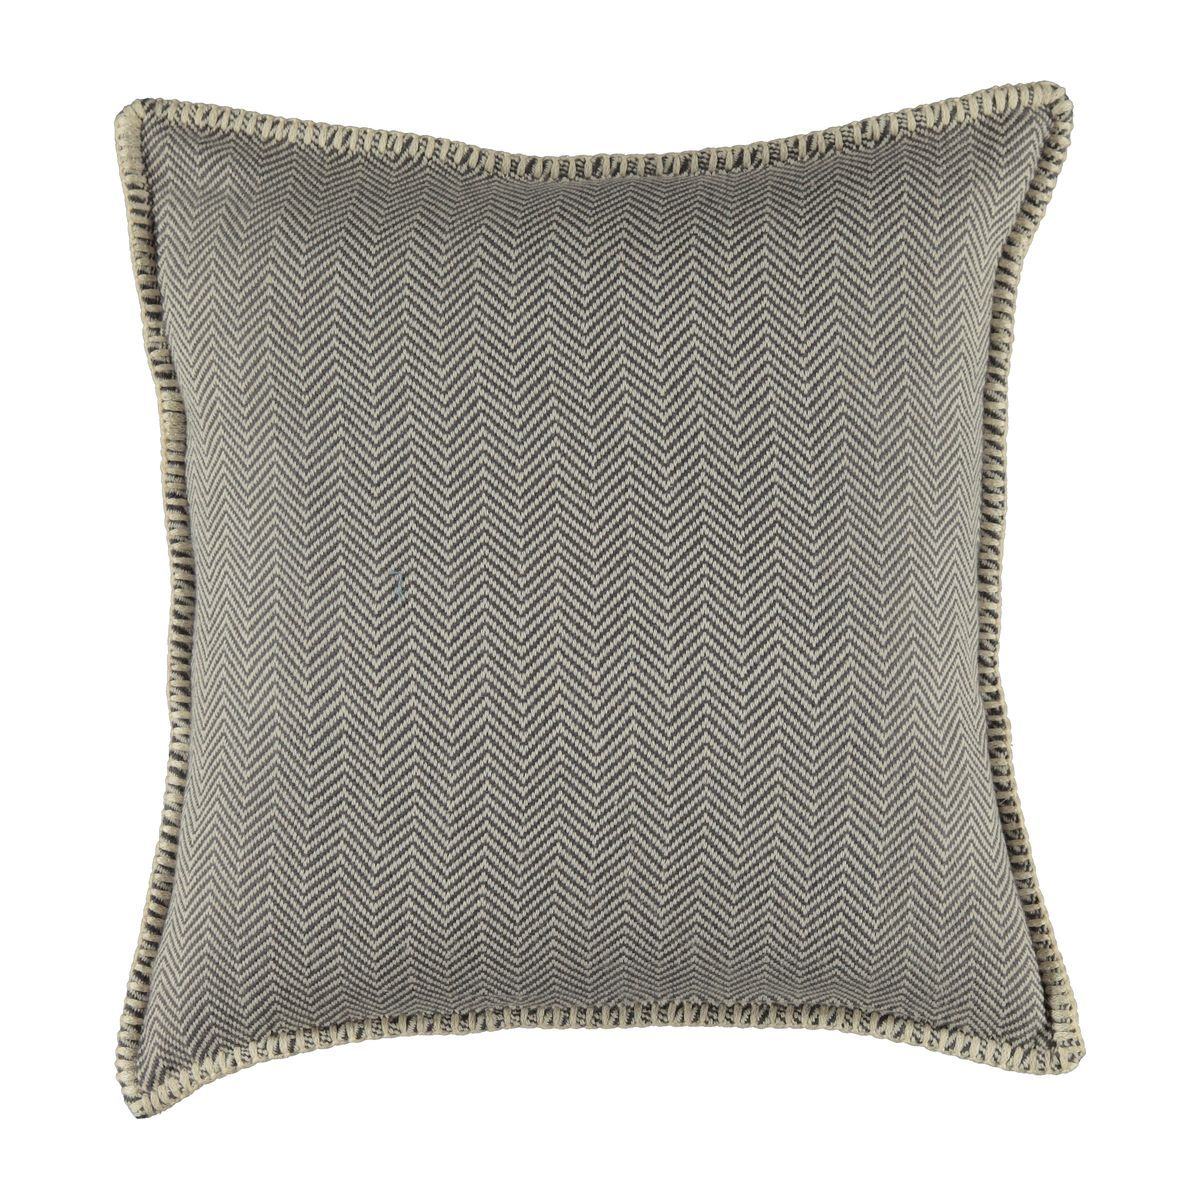 Cushion cover / ZigZag- Dark Grey / 40x40